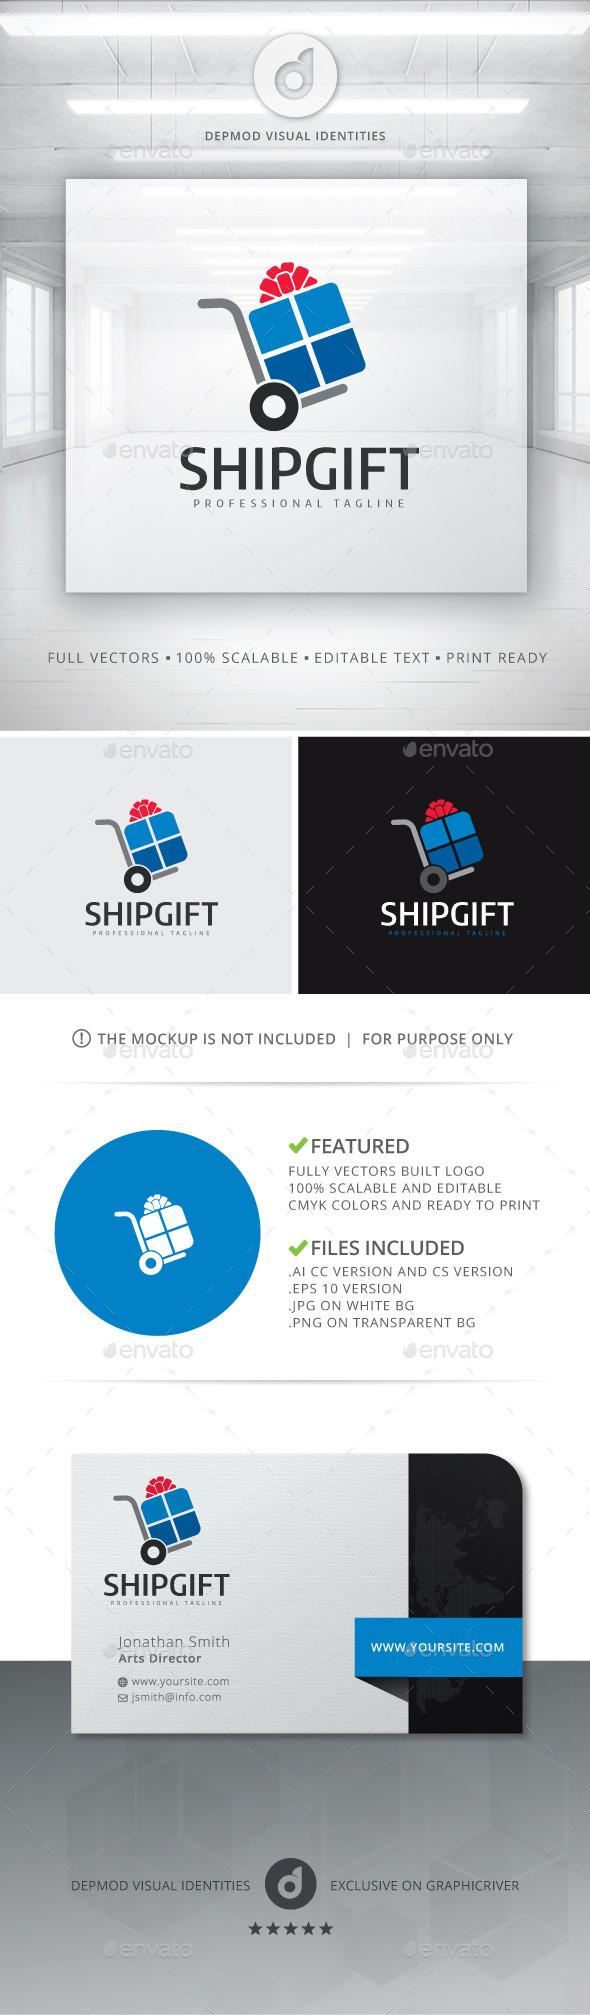 Ship Gift Logo